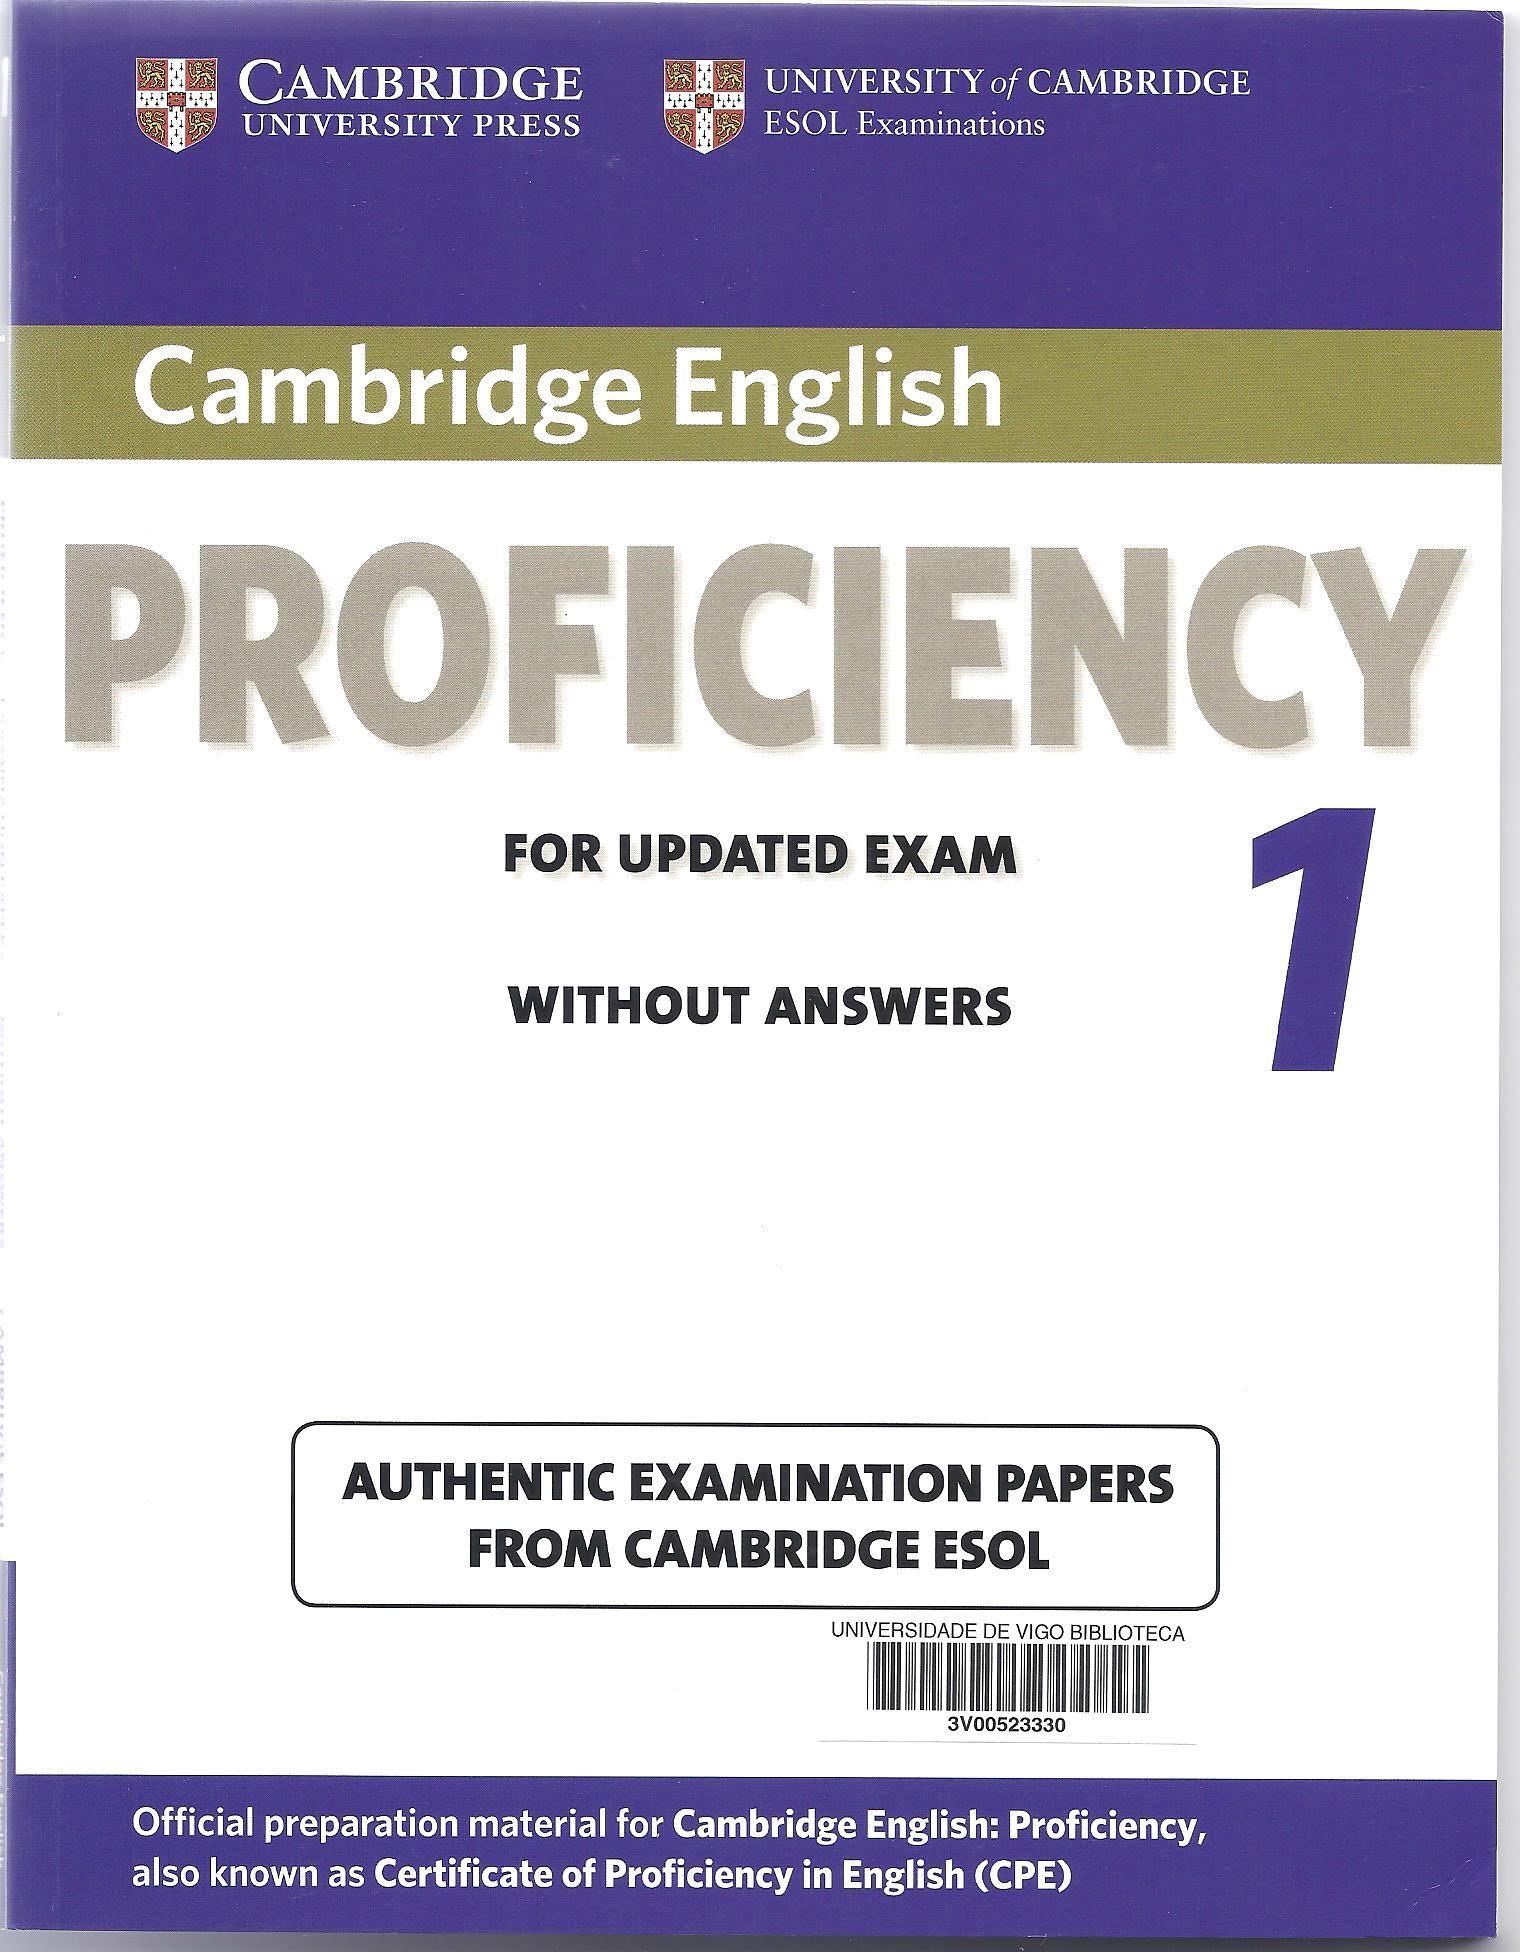 Cambridge english proficiency 1 authentic examination papers cambridge english proficiency 1 authentic examination papers from cambridge esol 1betcityfo Images